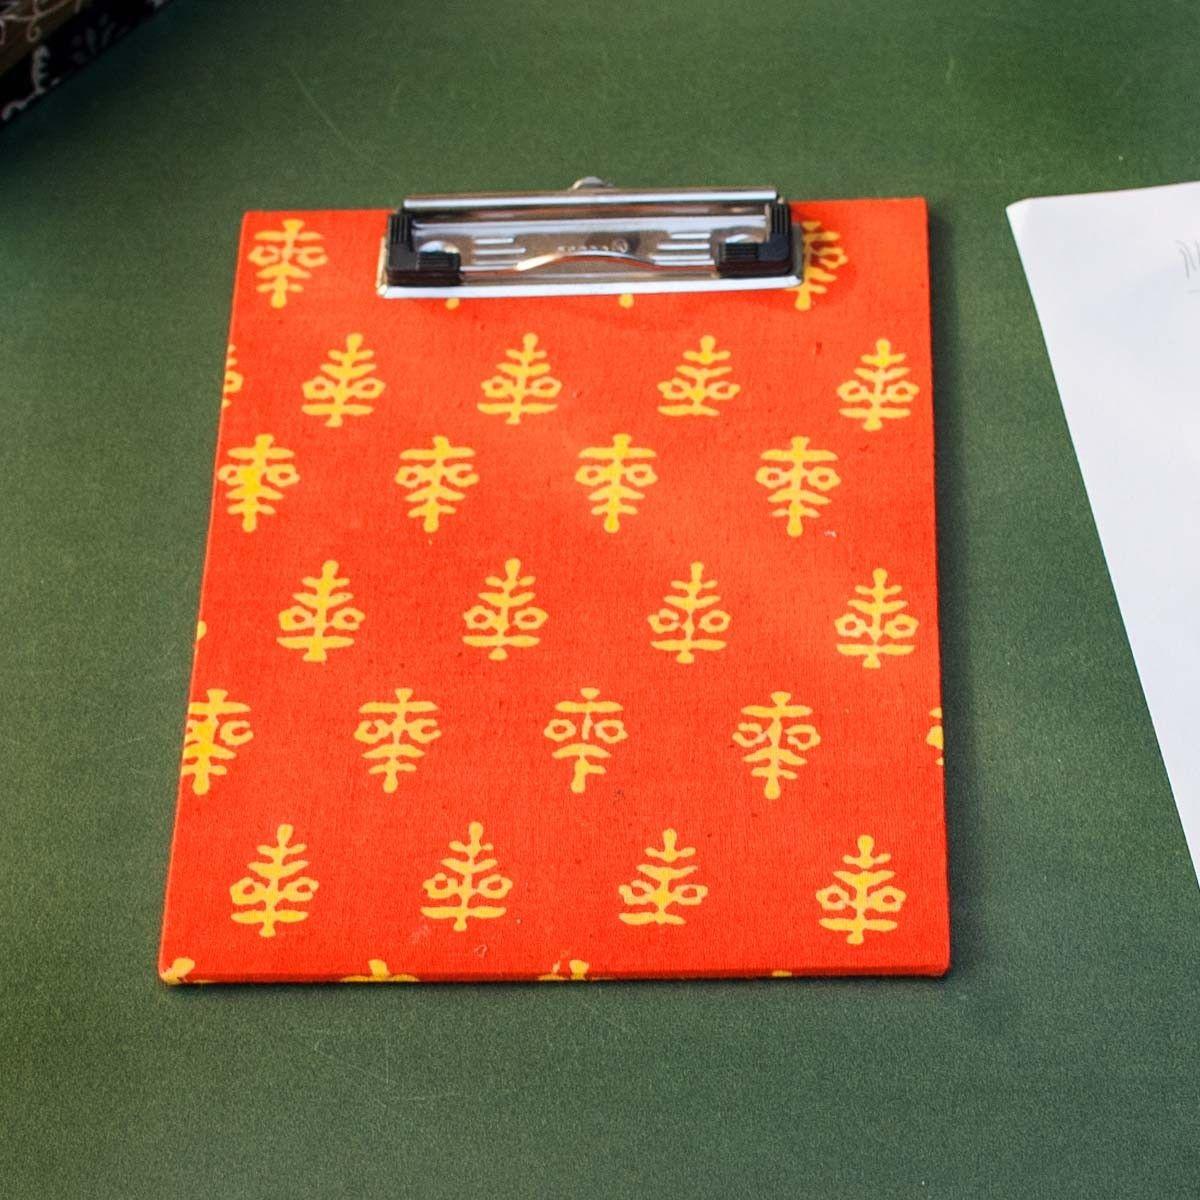 Orange Printed Fabric Cover Dafti Small - 9 x 6.5 Inch